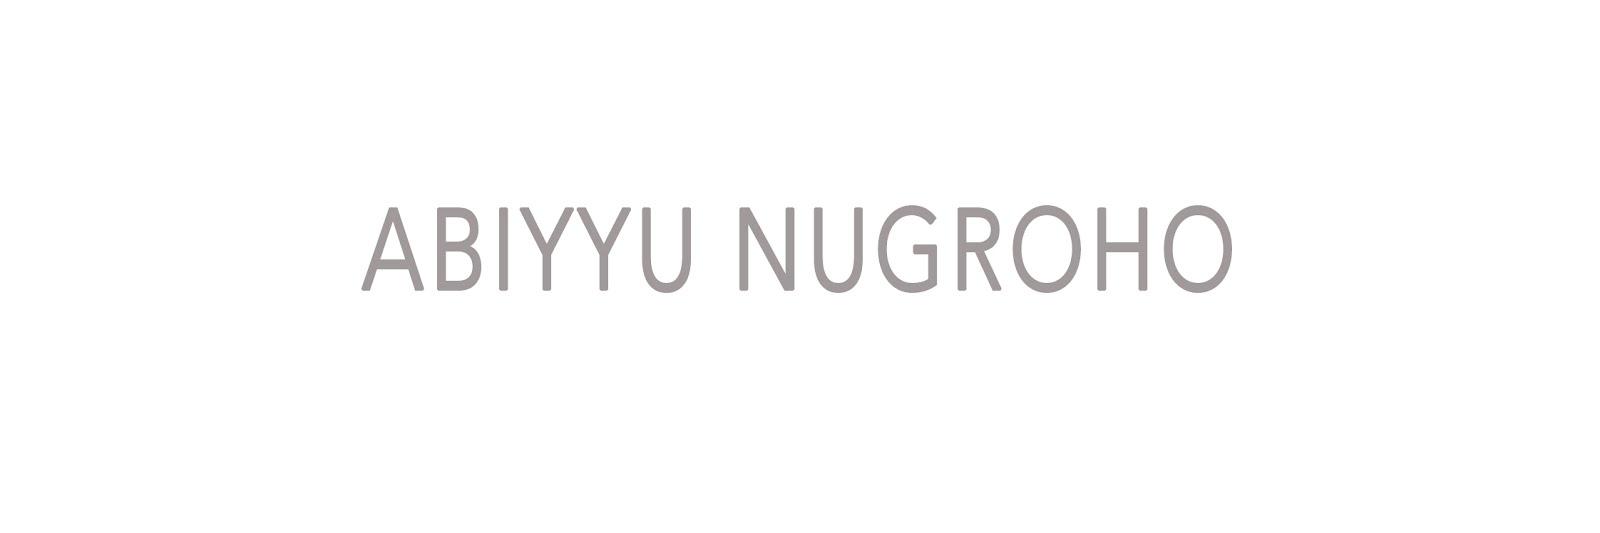 ABIYYU NUGROHO